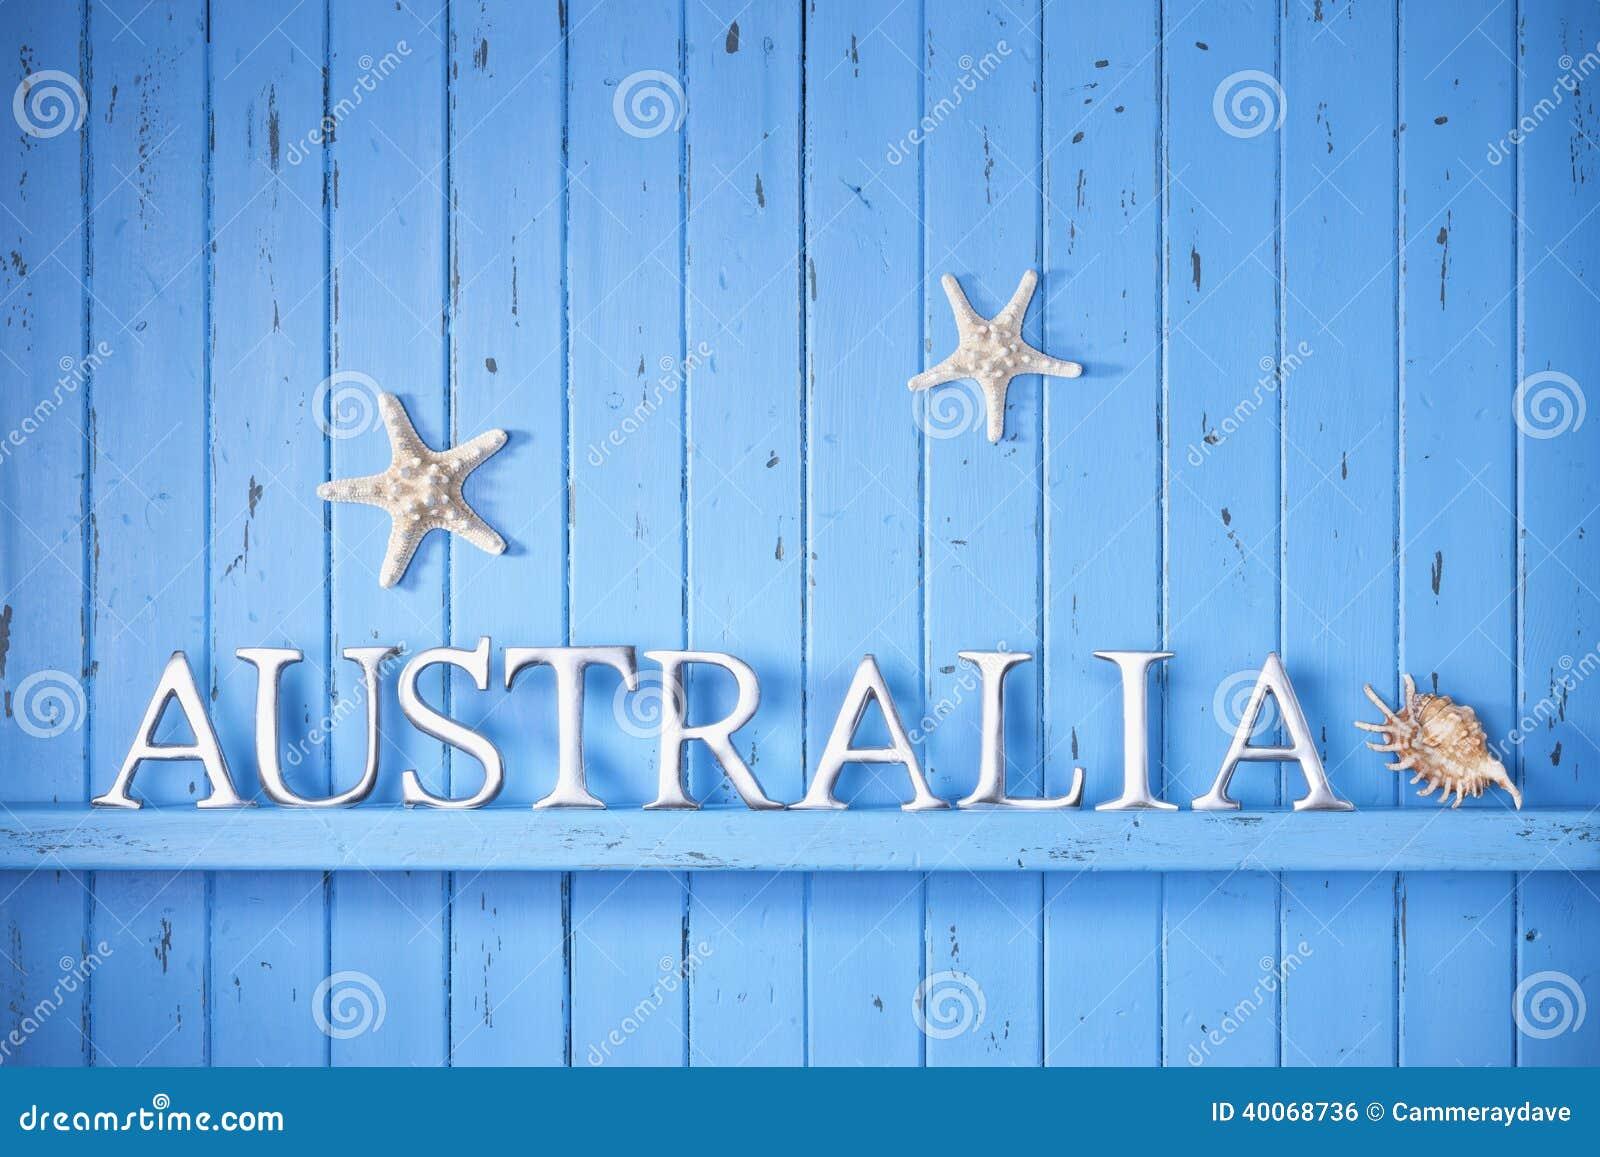 australia background stock photo  image of conceptual